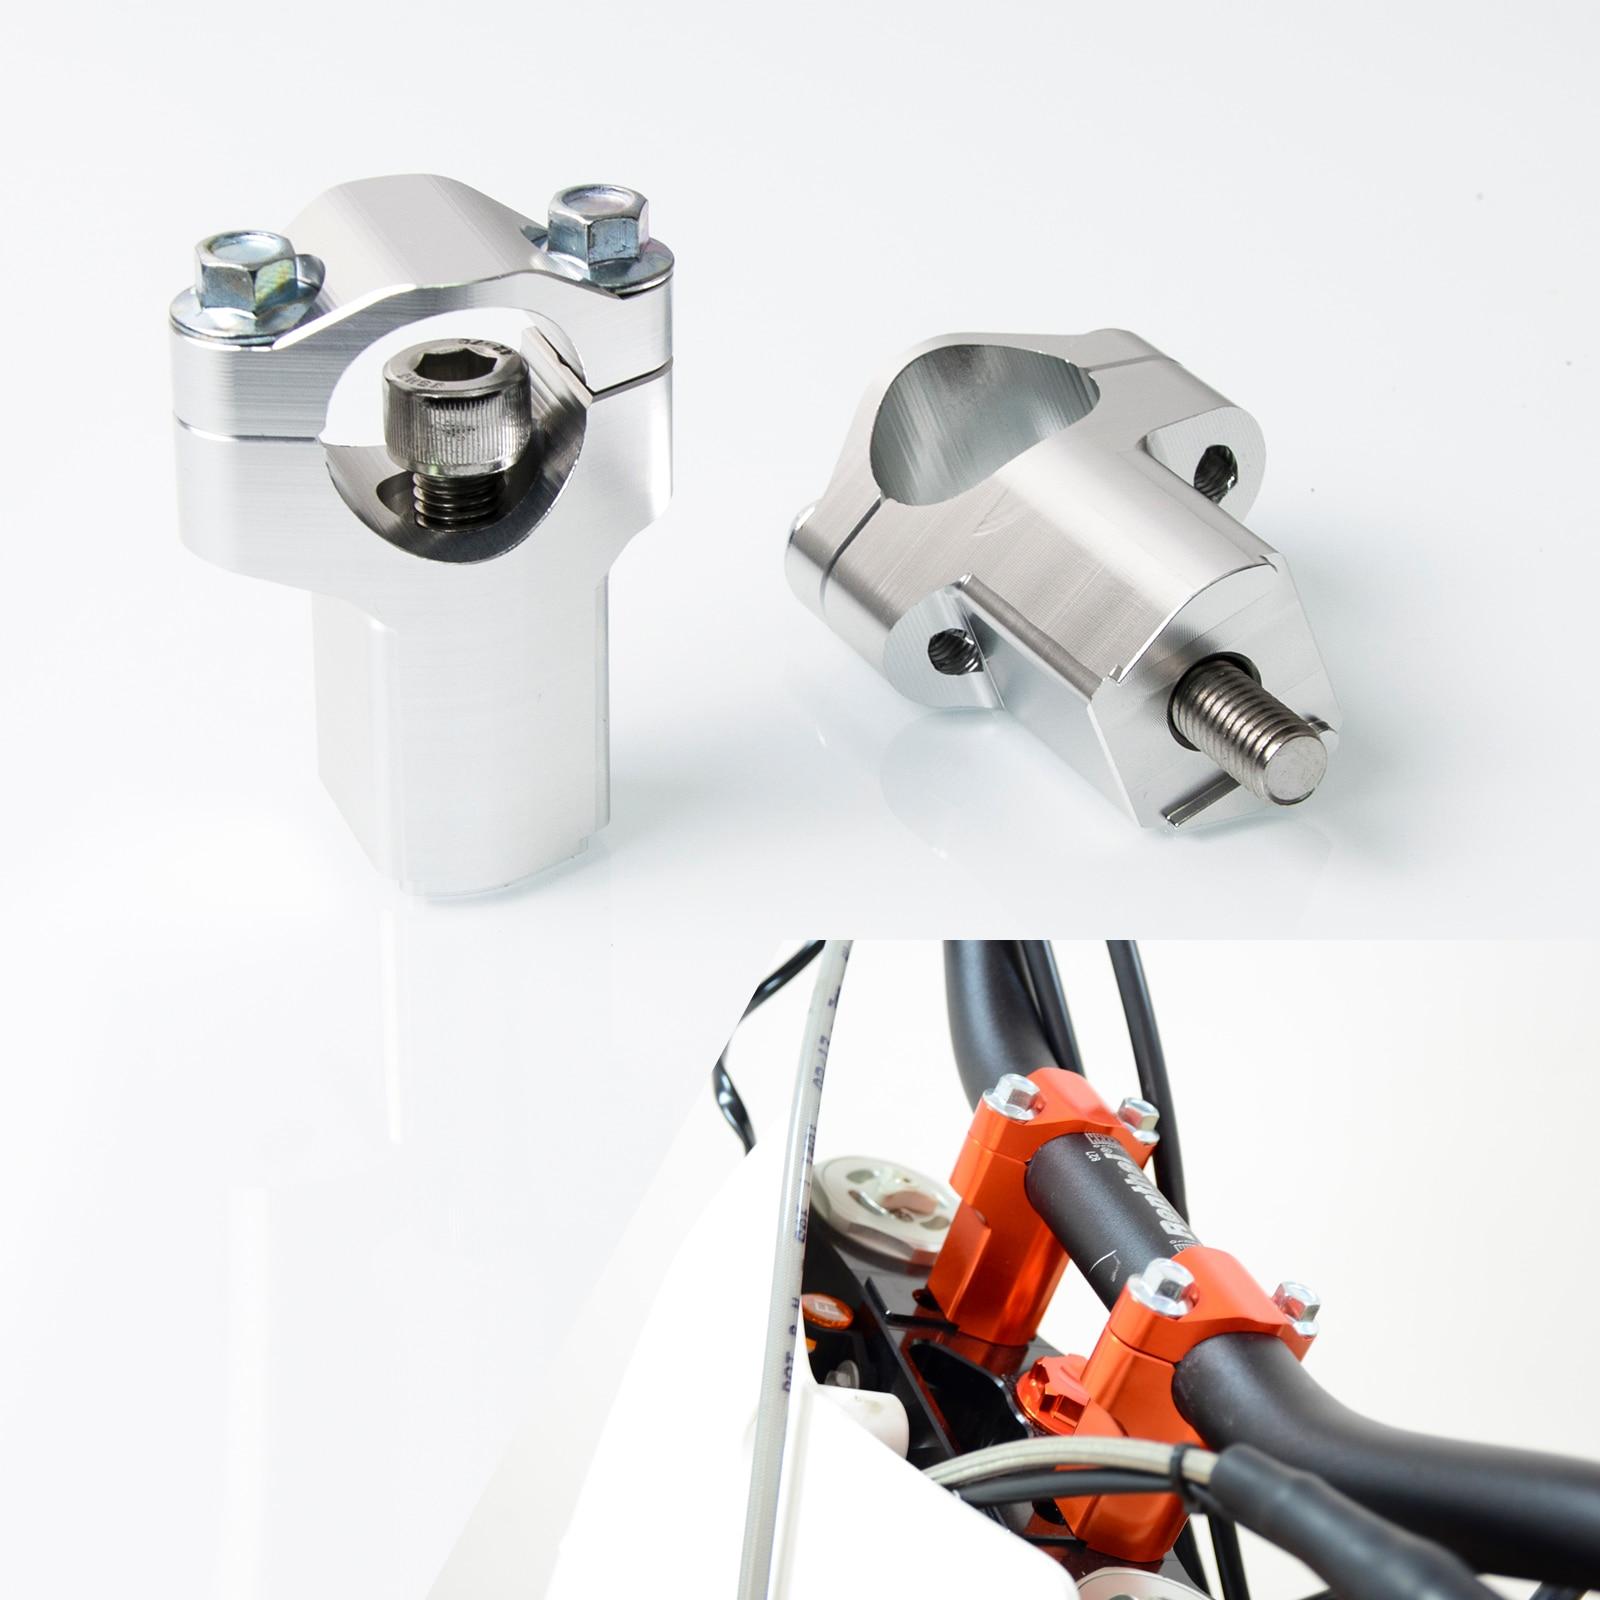 цена на NICECNC 28MM Handlebar Clamp Risers Bar Mount For KTM 125 150 200 250 300 350 400 450 500 505 525 530 SX SXF XC EXC 2006-2016